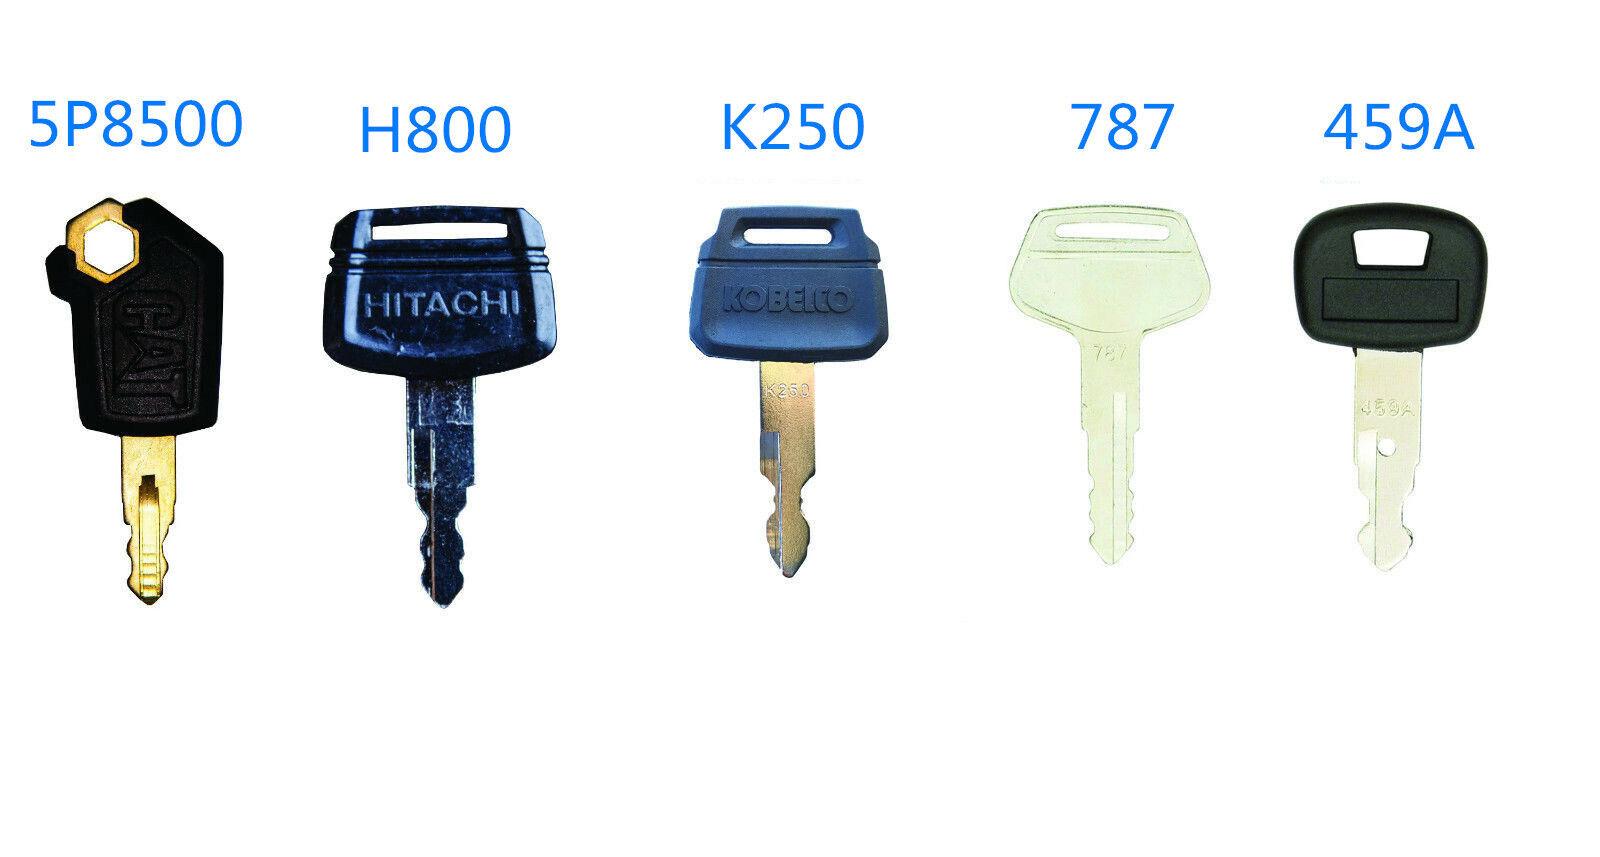 5Excavator Key For Caterpillar Hitachi H800 Kobelco K250 Komatsu 787 Kubota 459A